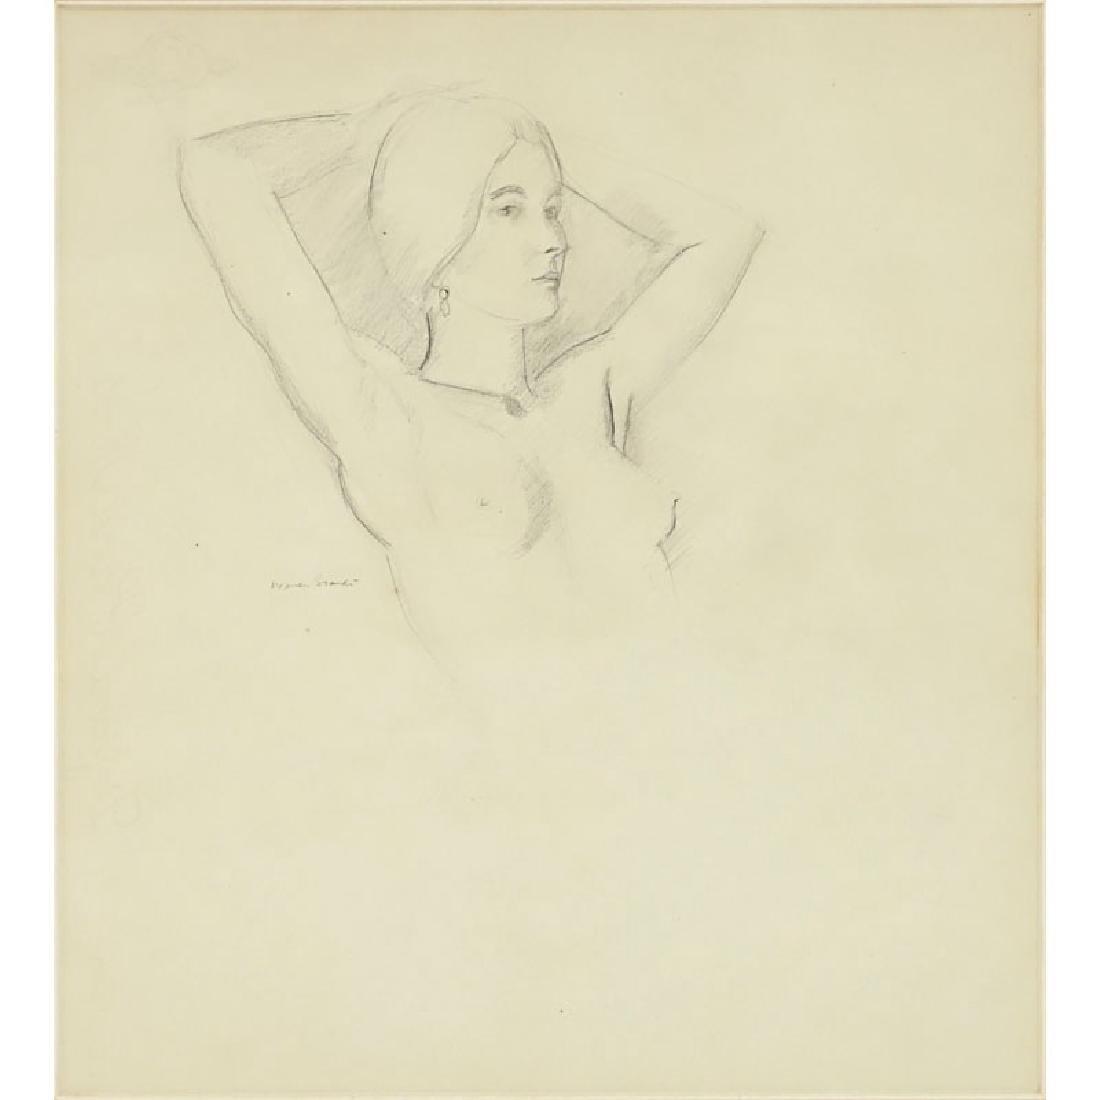 Warren Brandt, American (1918 - 2002) Drawing on paper